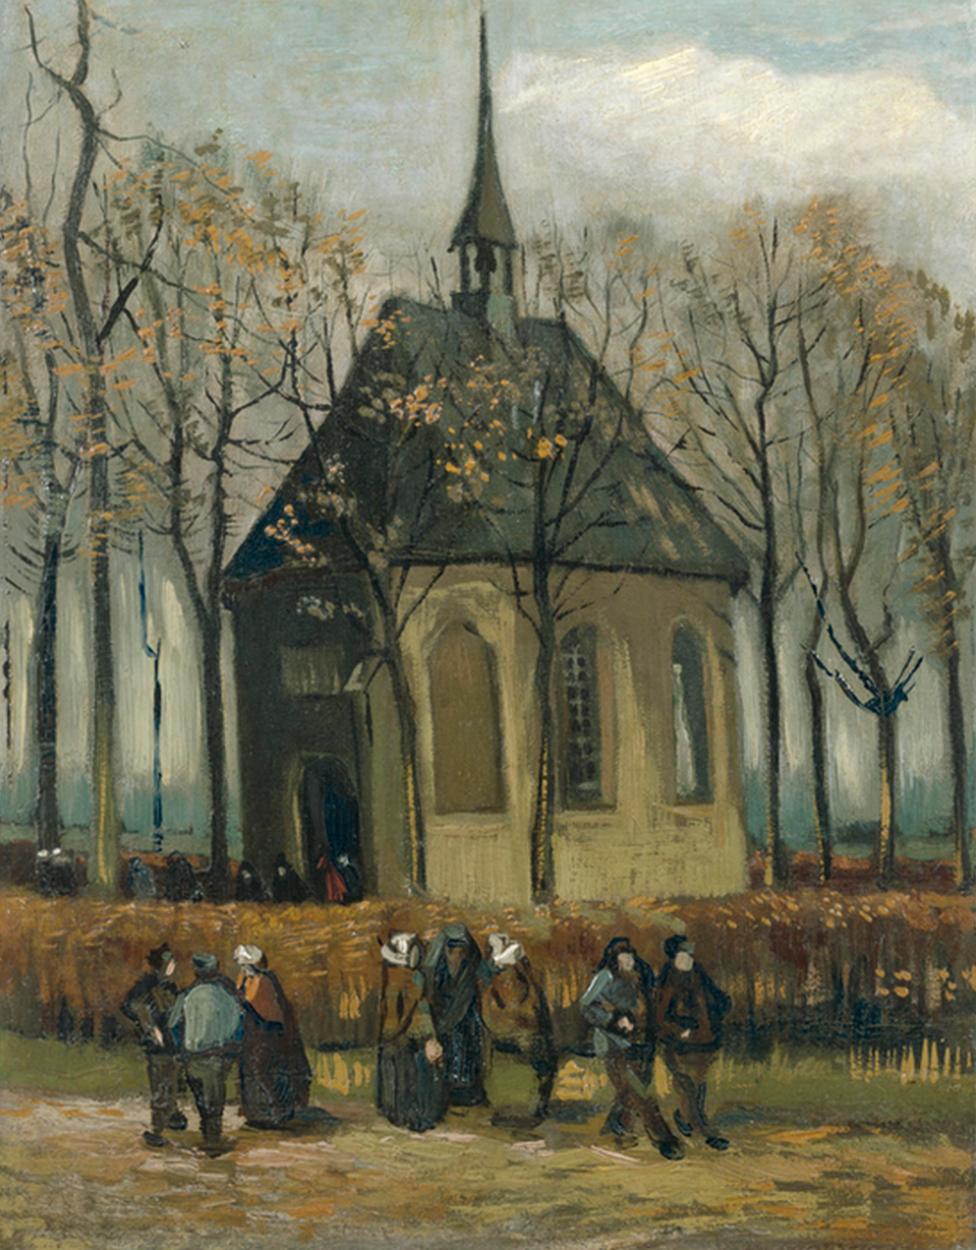 Vincent van Gogh, Congregation Leaving the Reformed Church in Nuenen, 1884 - 1885